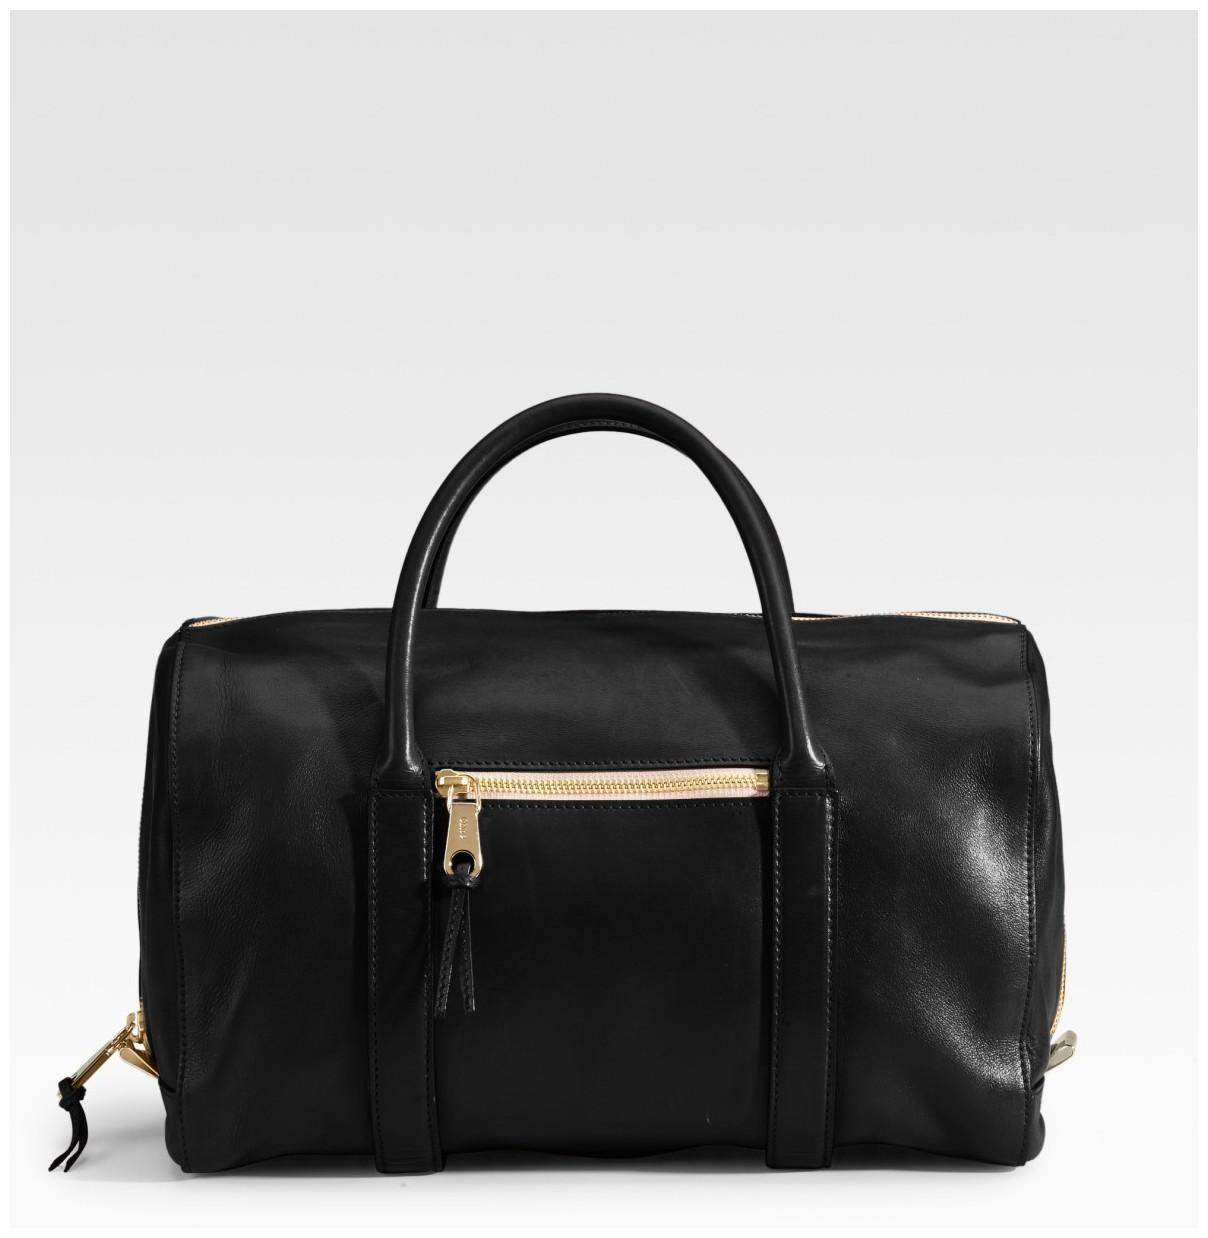 Designer Duffle Bags On Wheels